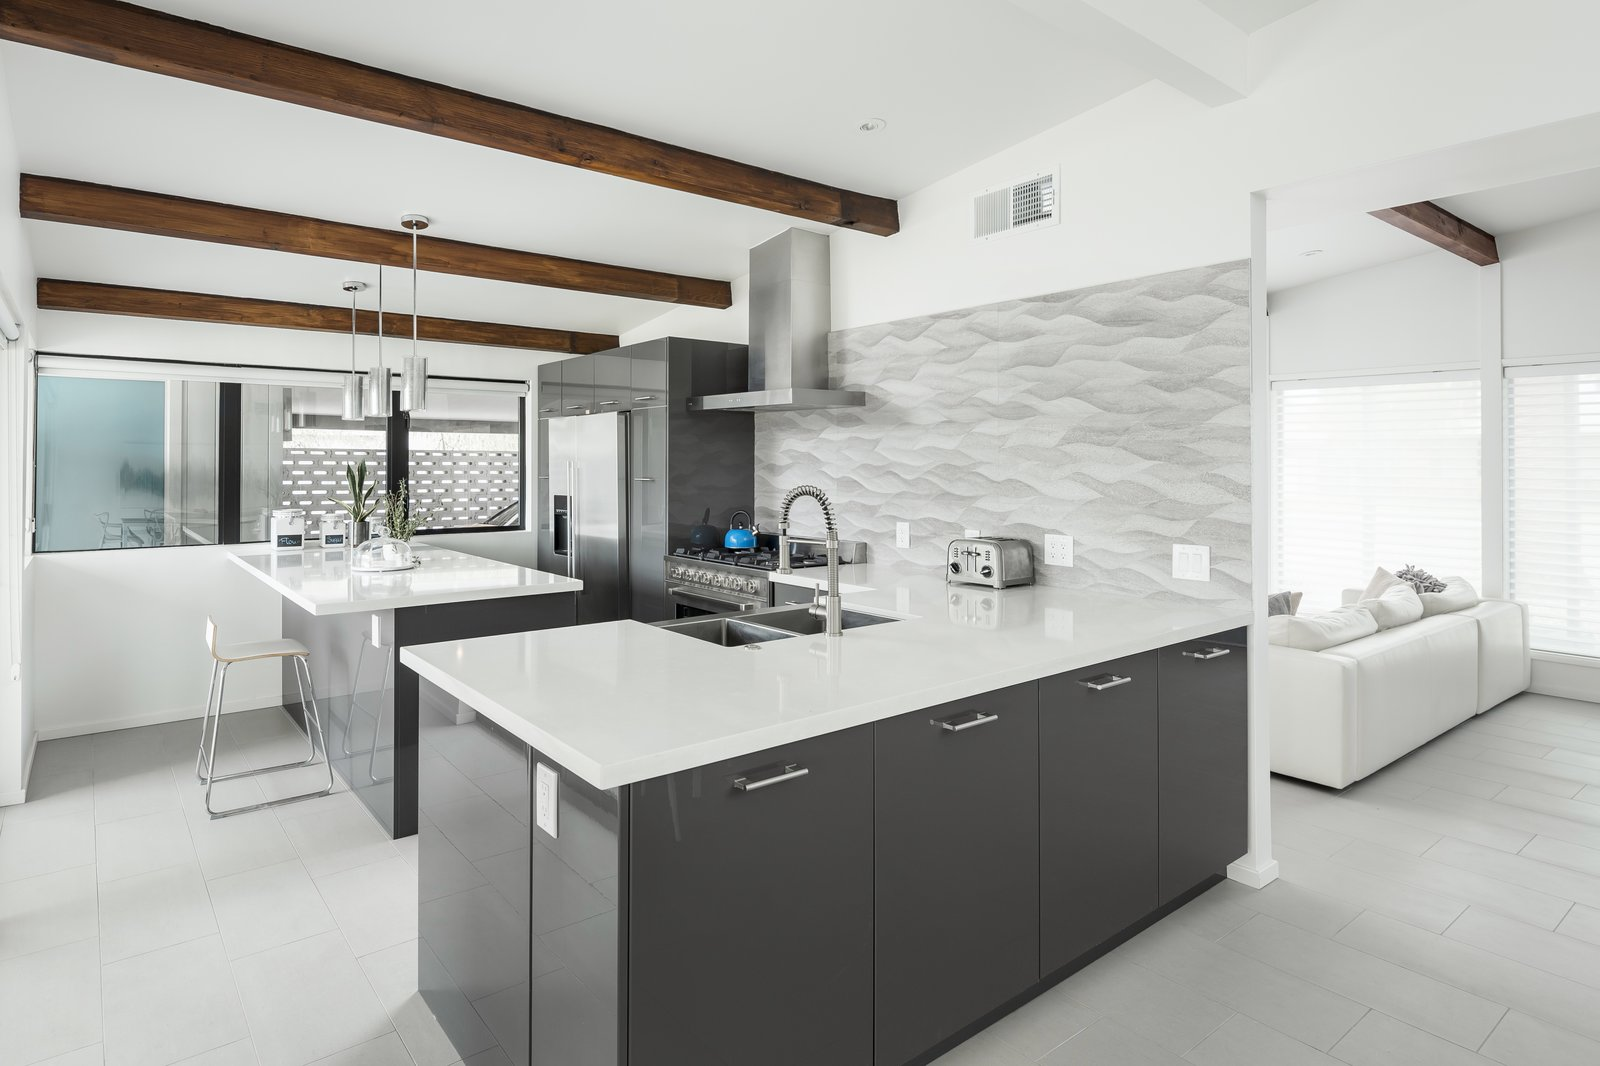 Kitchen Tagged: Kitchen, Engineered Quartz Counter, Porcelain Tile Floor, Porcelain Tile Backsplashe, Ceiling Lighting, Pendant Lighting, Range, Range Hood, Refrigerator, and Undermount Sink.  Schreiber House by The Ranch Mine